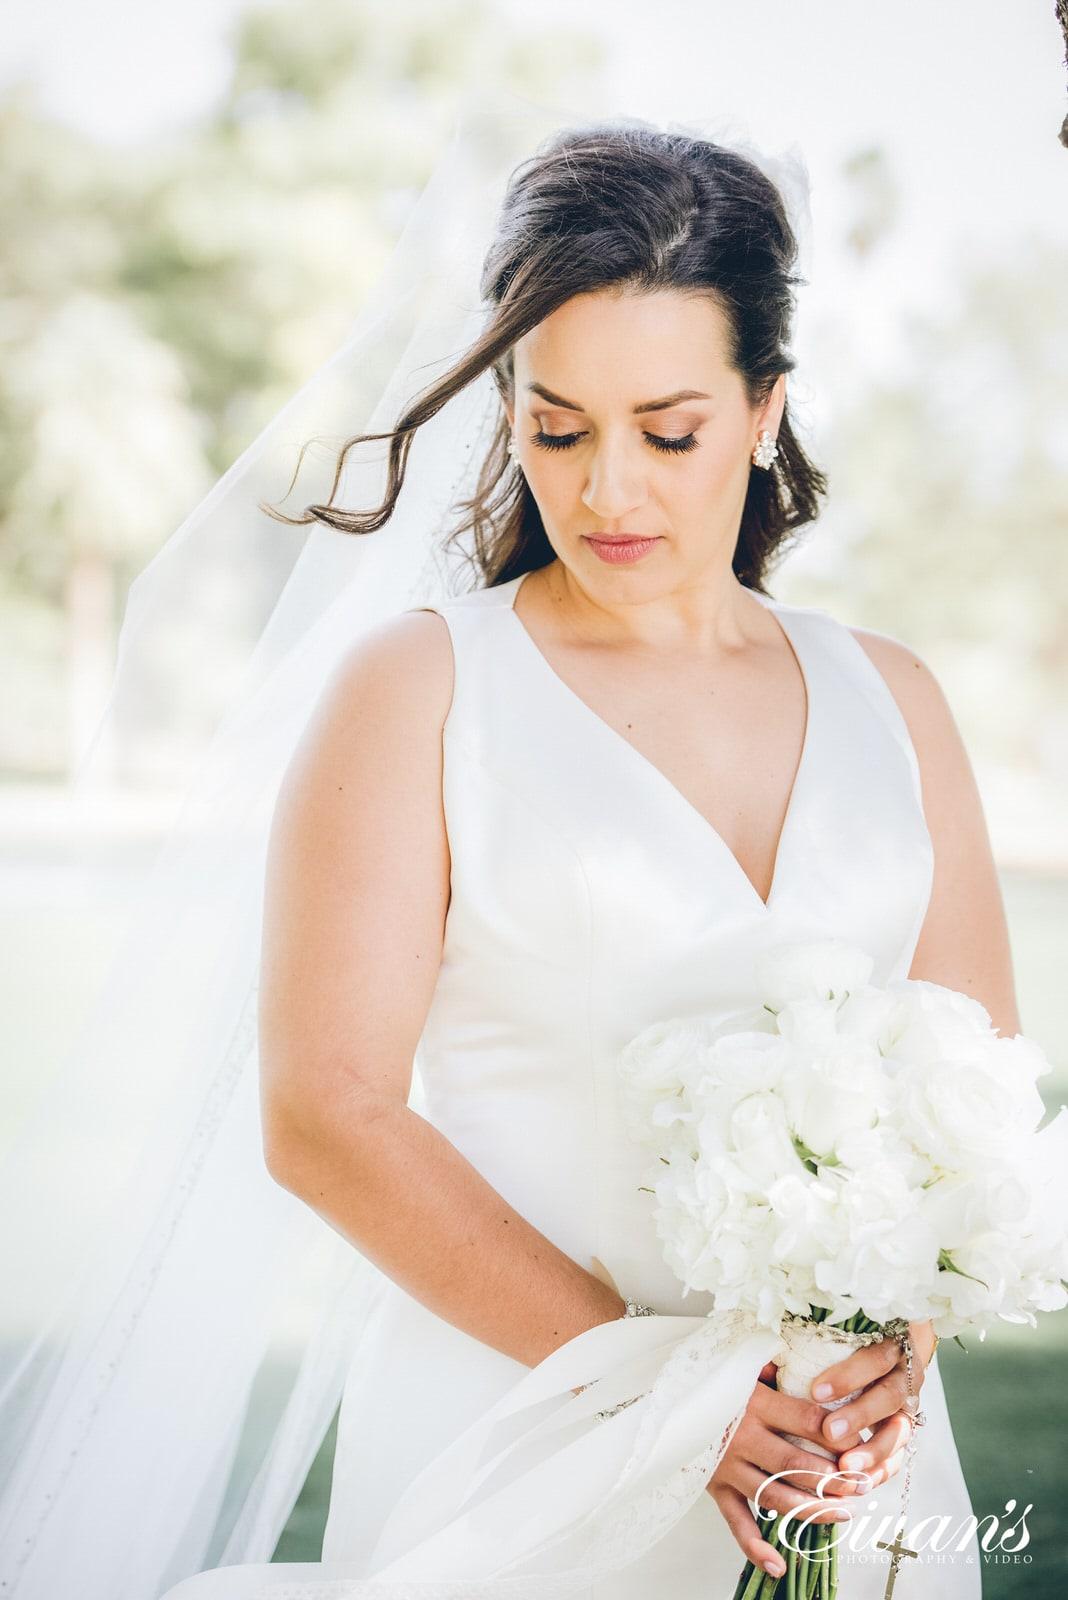 portrait of a woman in a long white dress